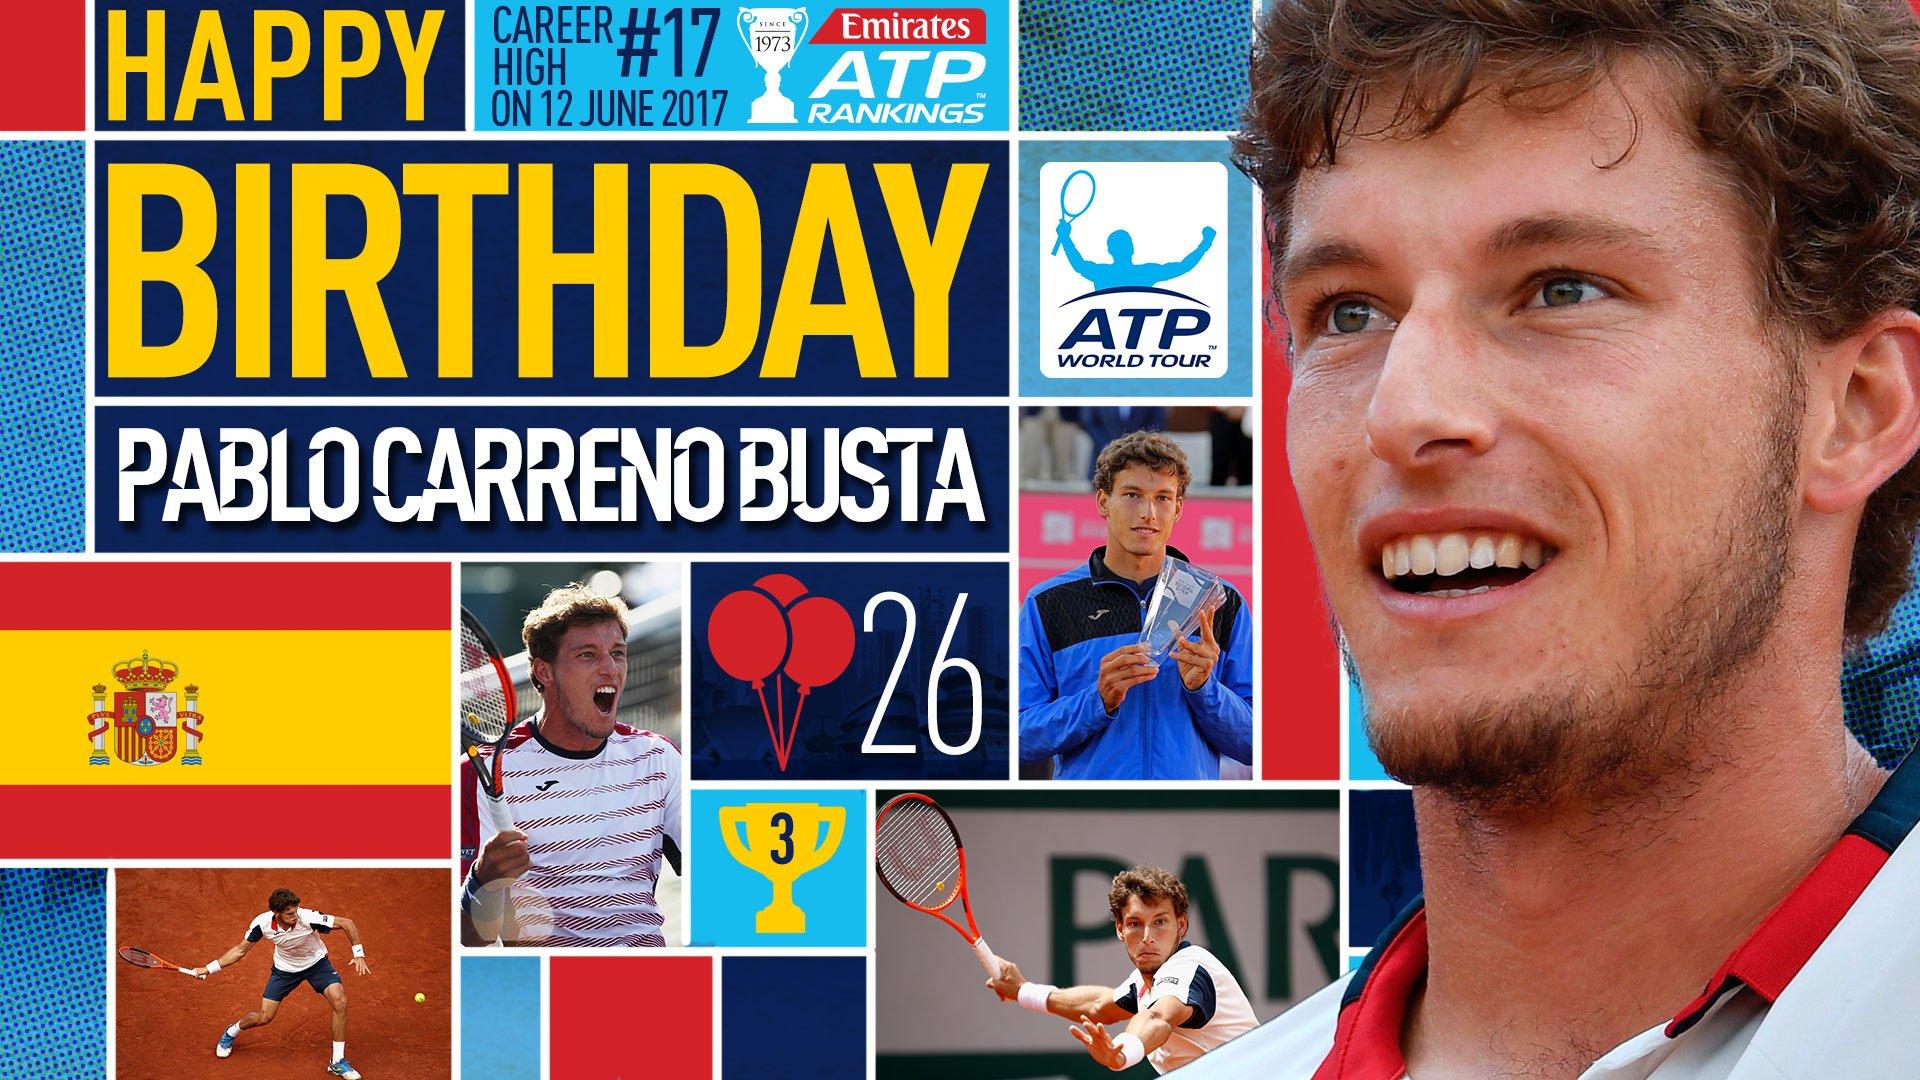 Happy 26th birthday to World No.17 @pablocarreno91! Feliz cumple �� View #ATP Profile: https://t.co/SrSbq3rmYb https://t.co/LfTlQqTOrT